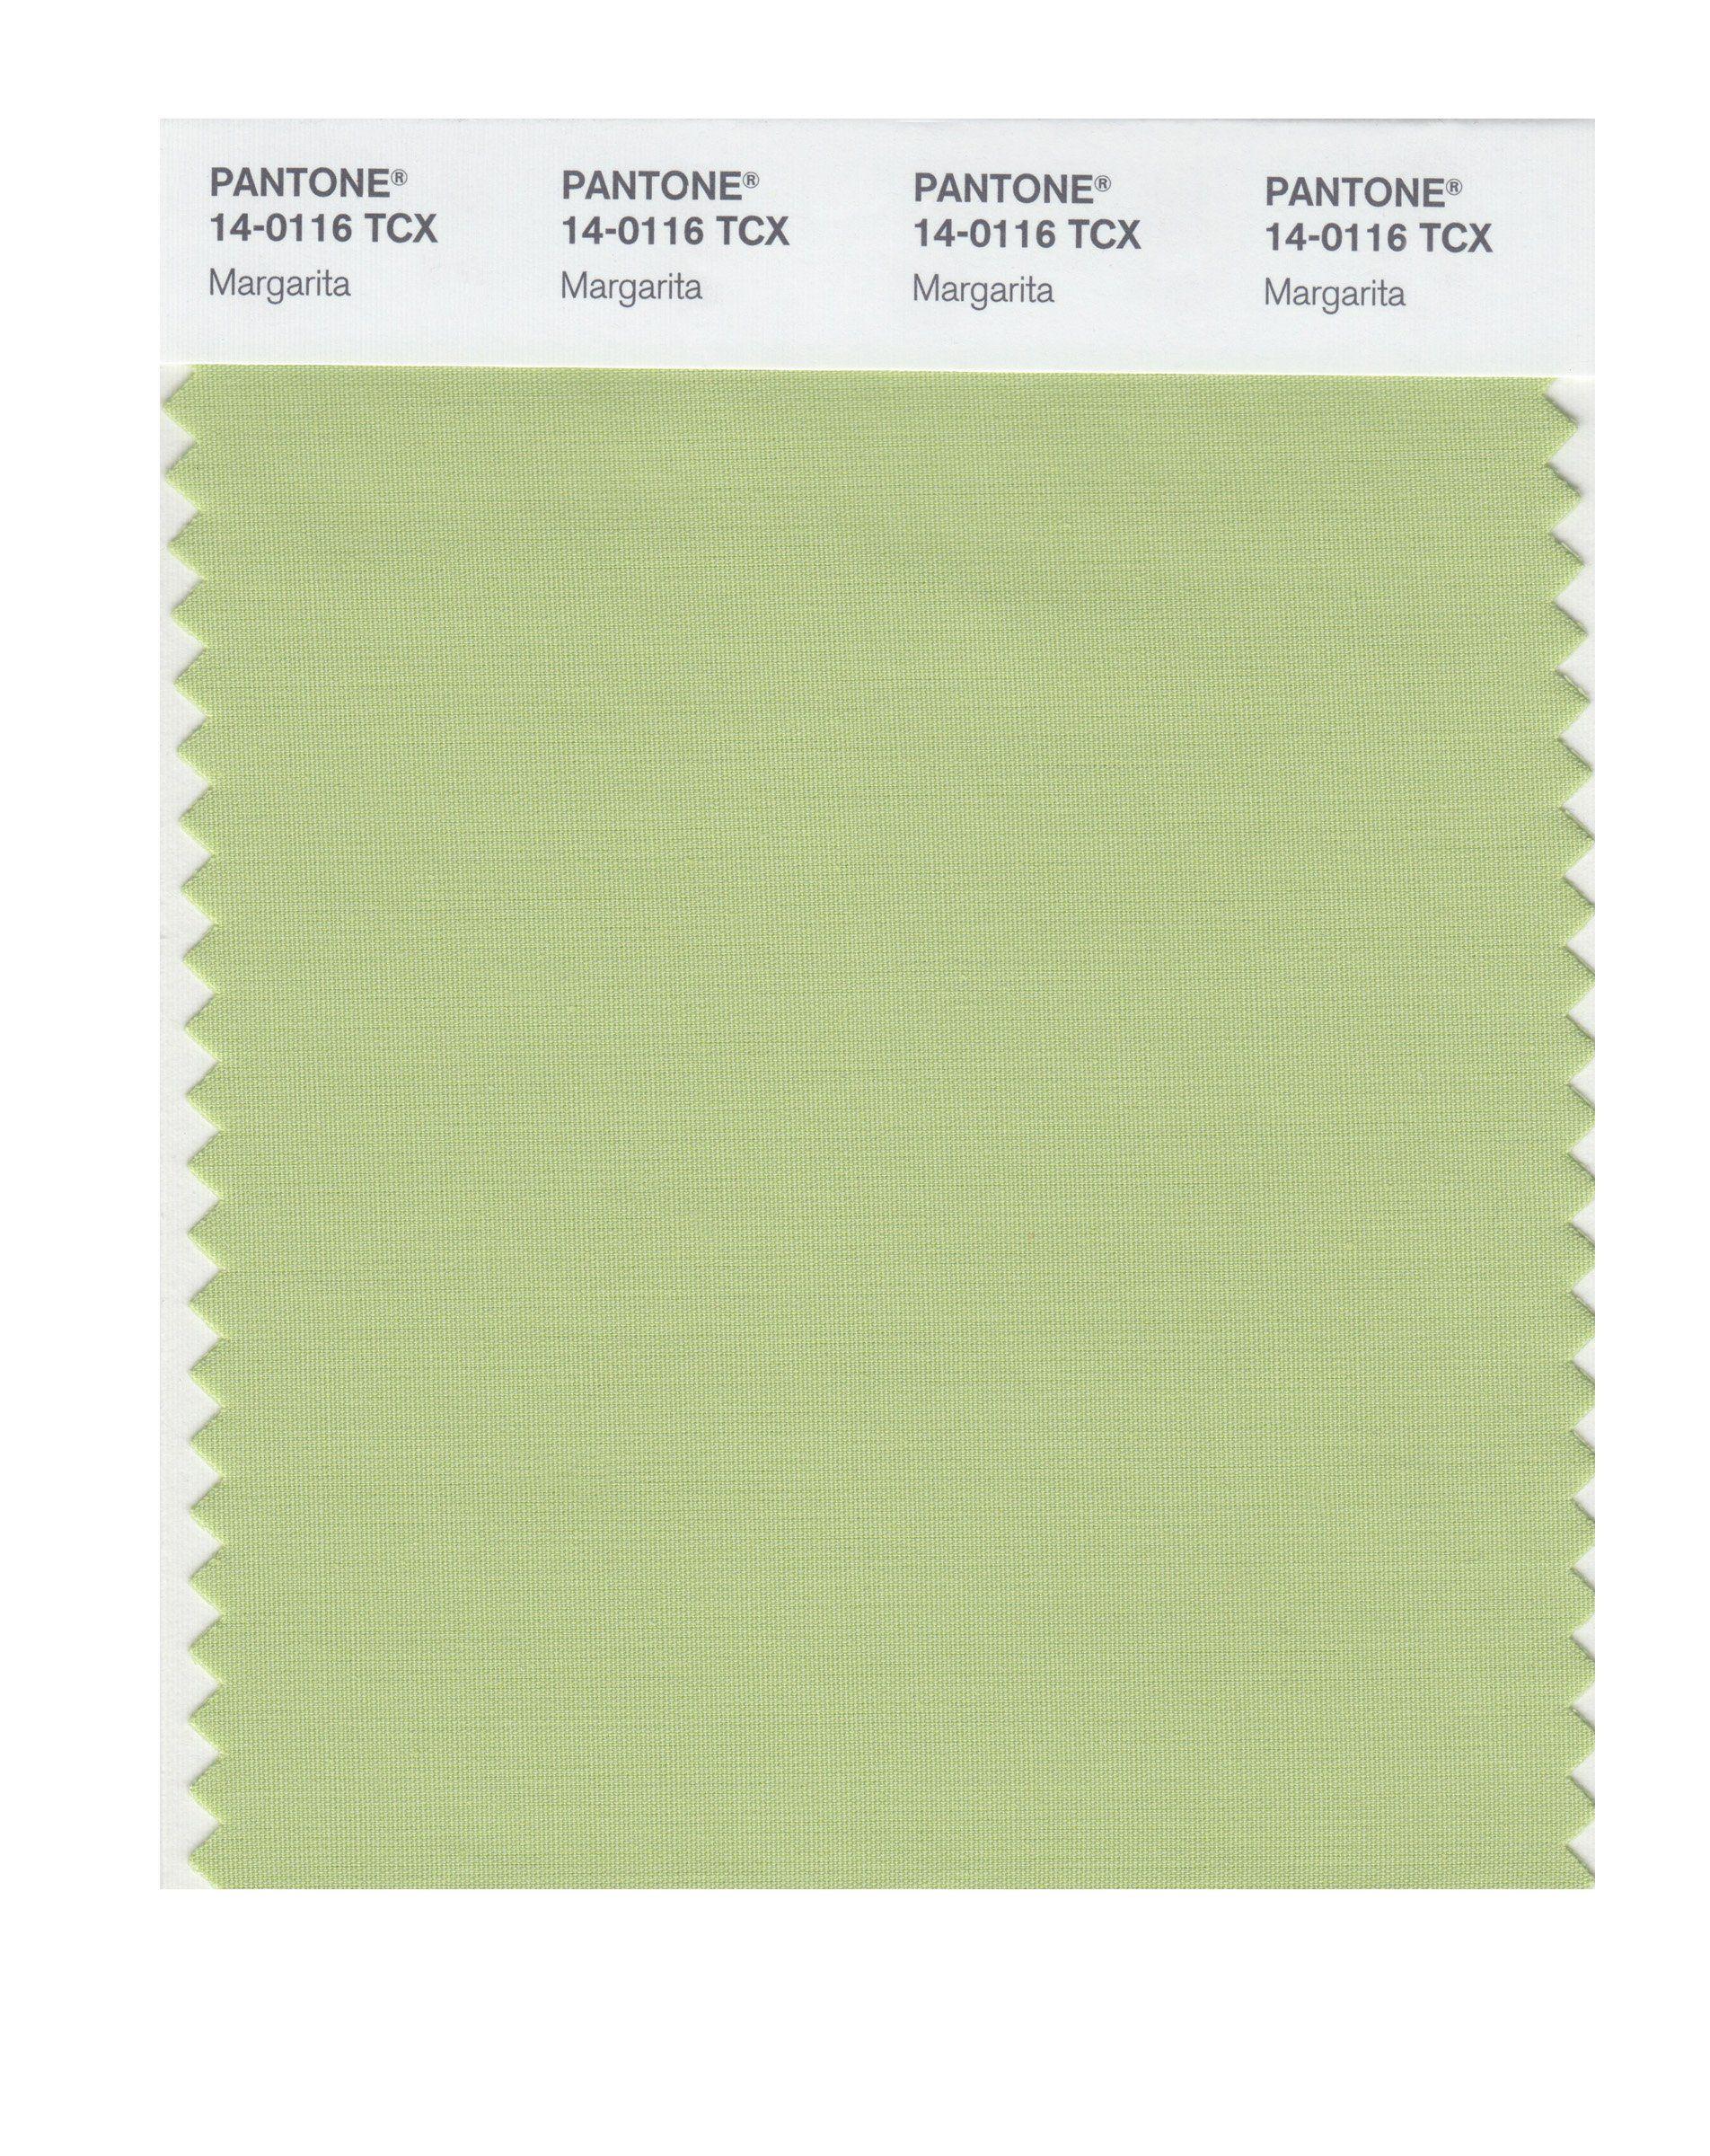 Pantone Smart Swatch 14-4310 Blue Topaz, Painting Supplies & Wall Treatments - Amazon Canada